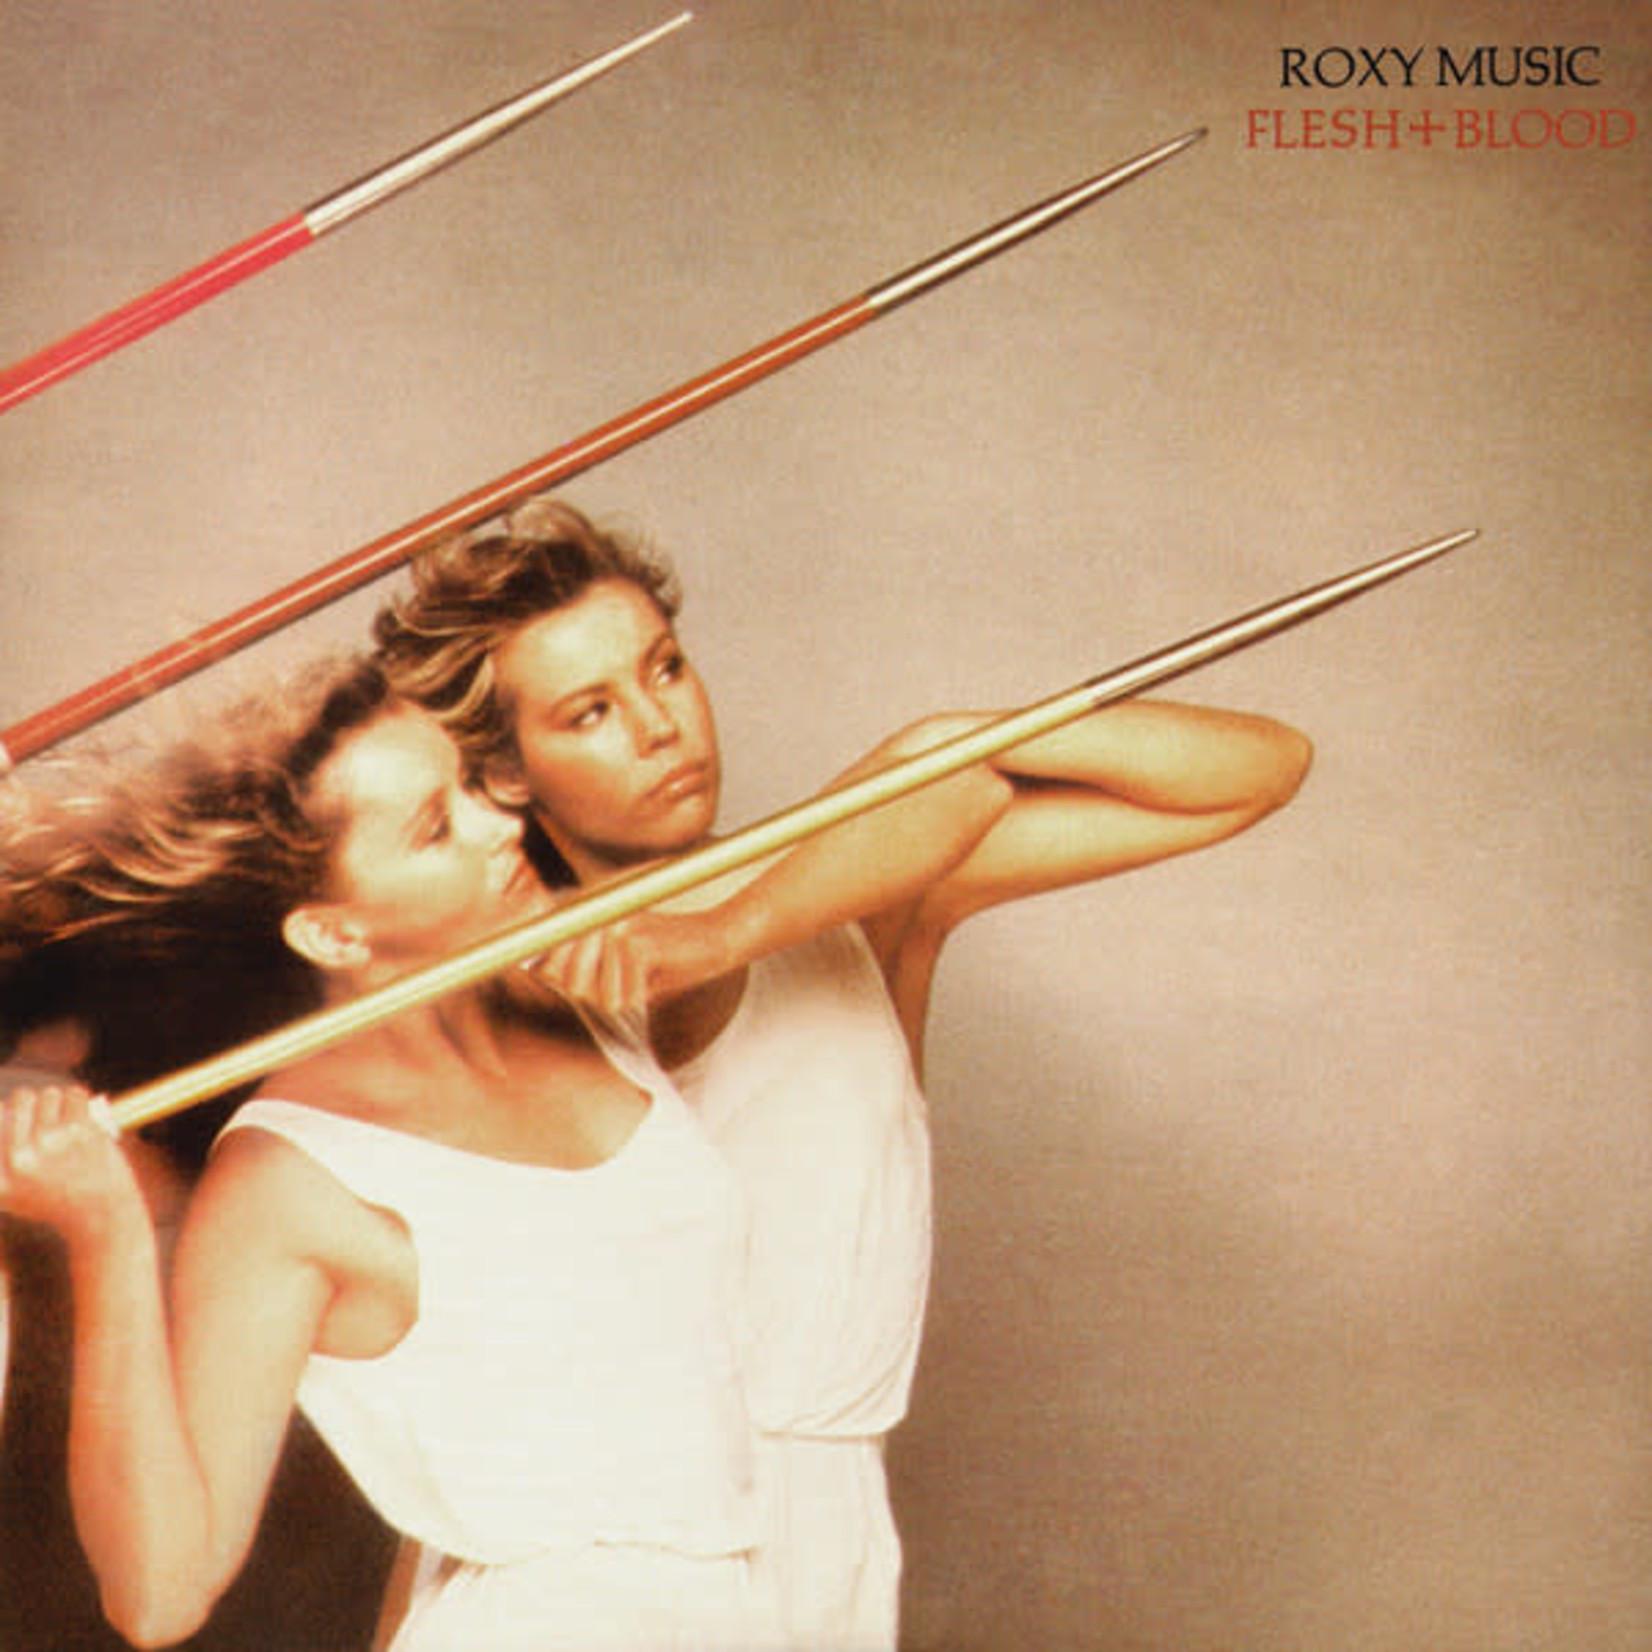 [Vintage] Roxy Music: Flesh & Blood